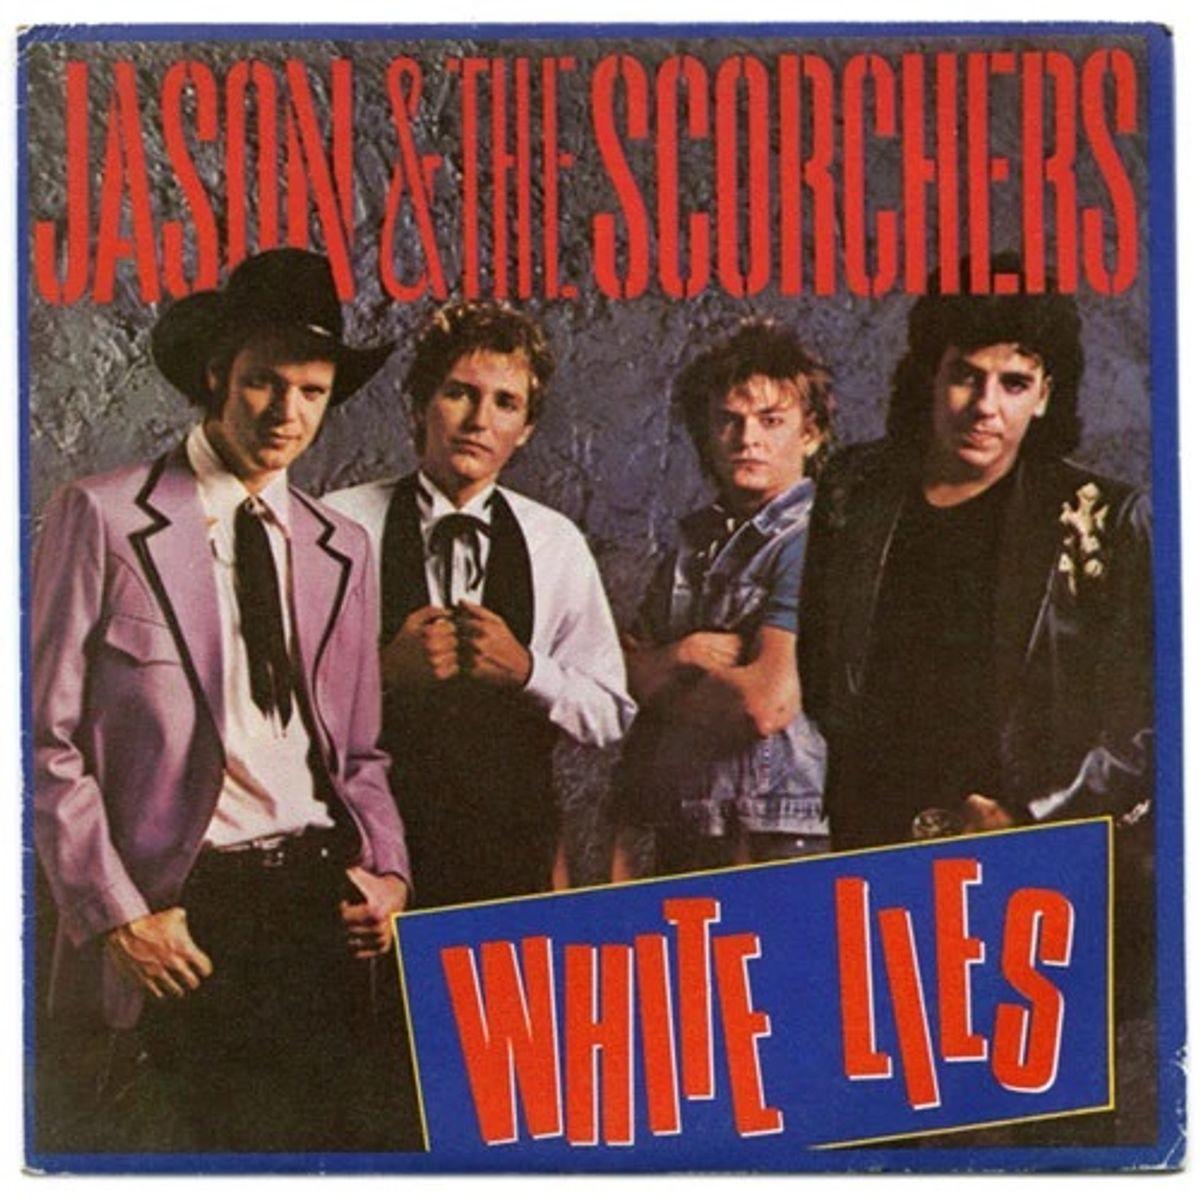 #Rampetampen - Jason & the Scorchers - White Lies (1985)